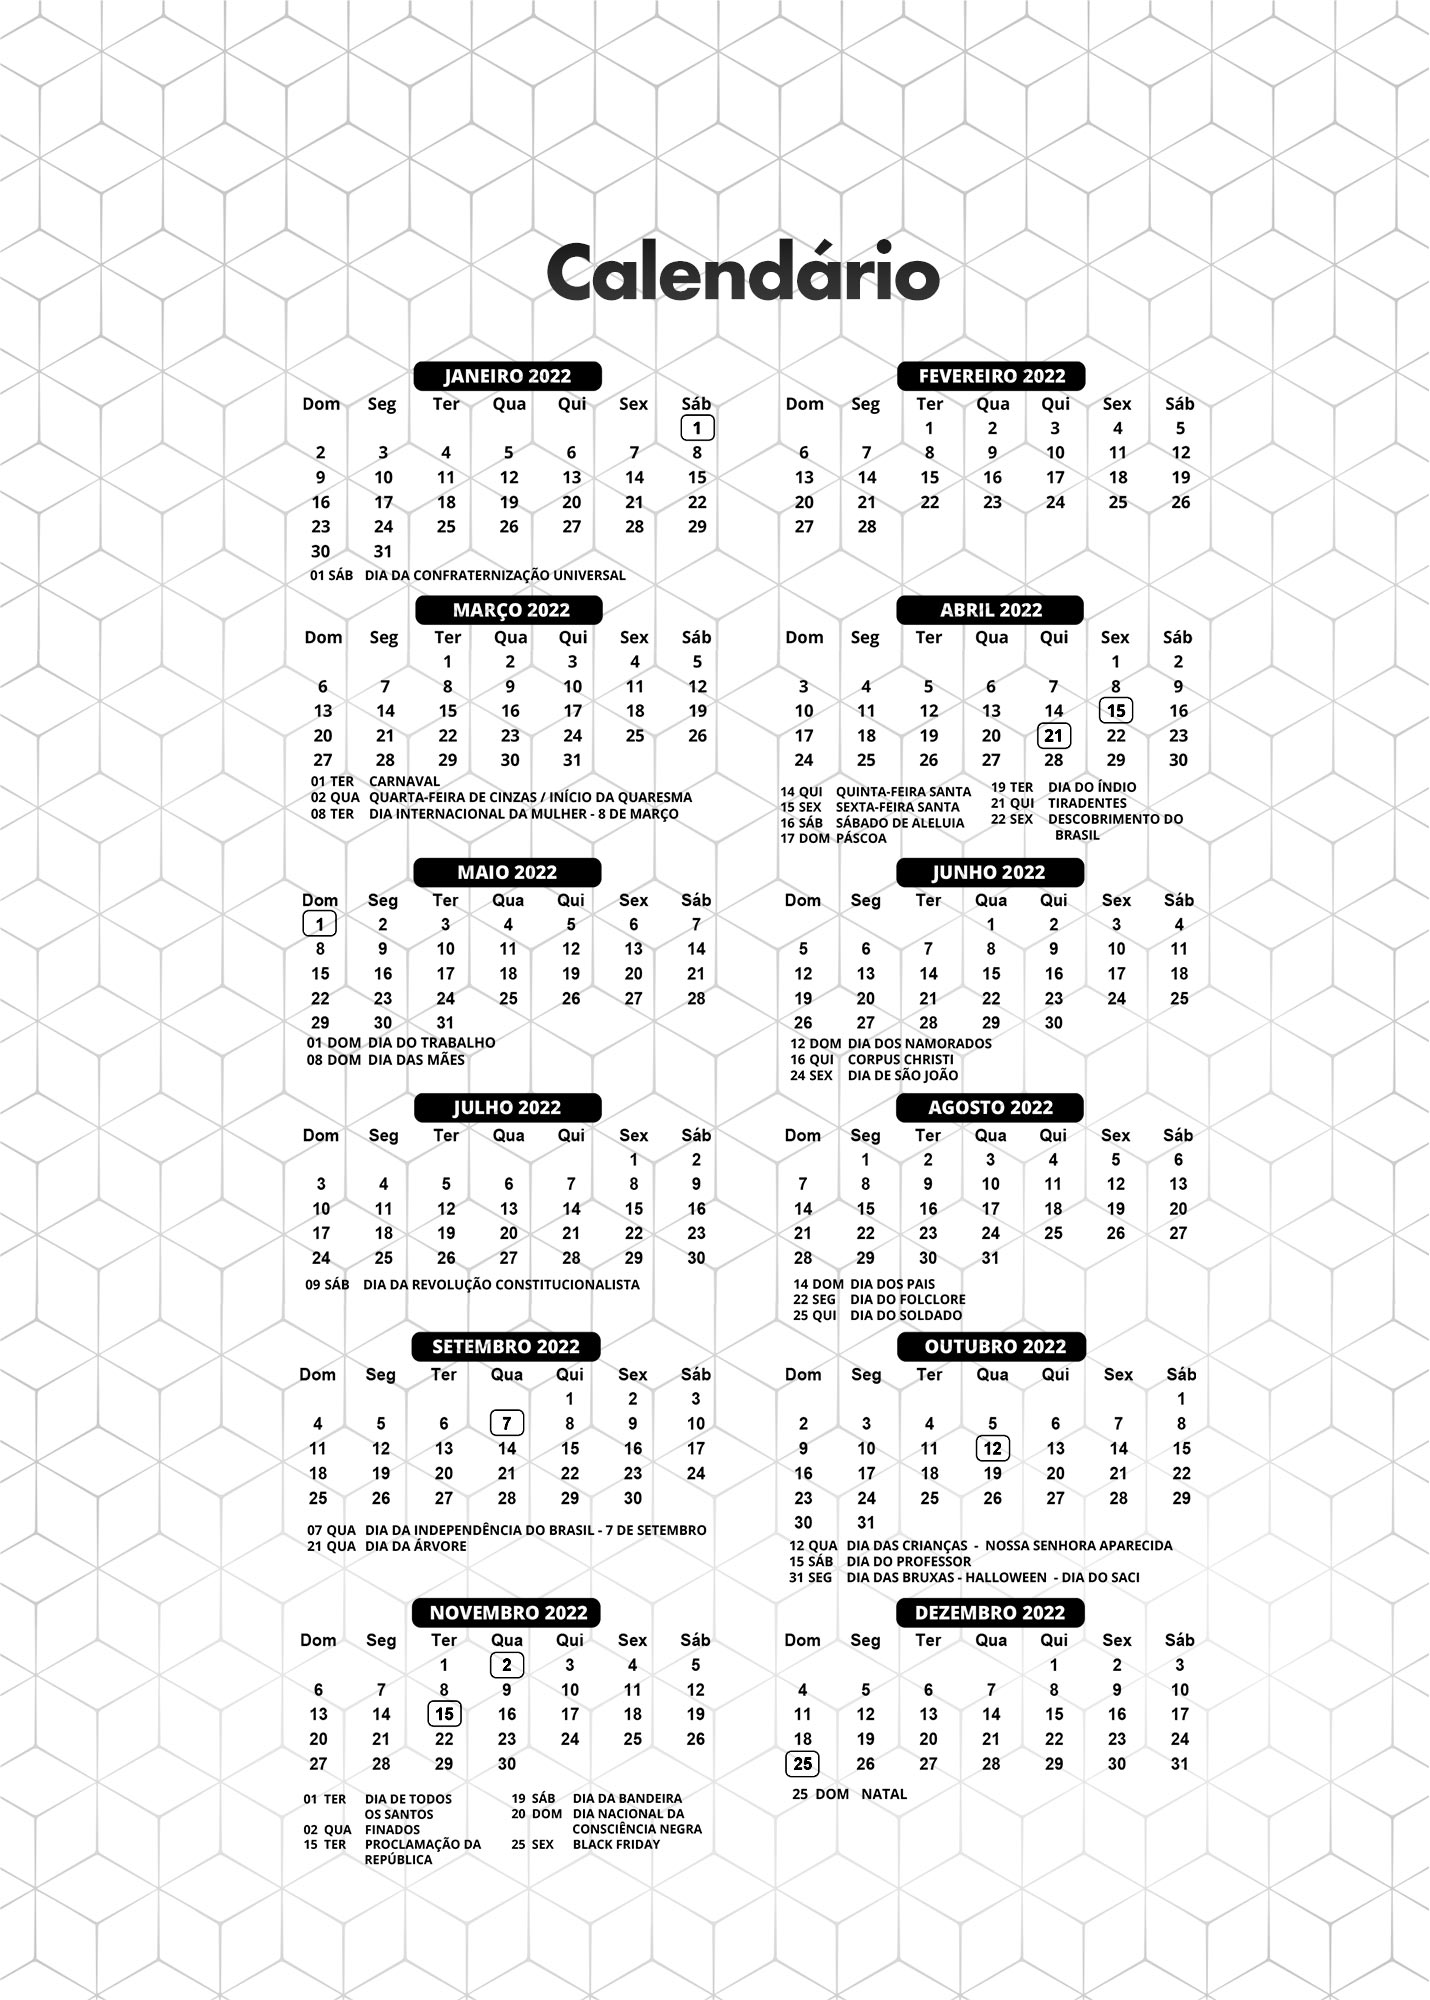 Calendario 2022 Preto e Branco